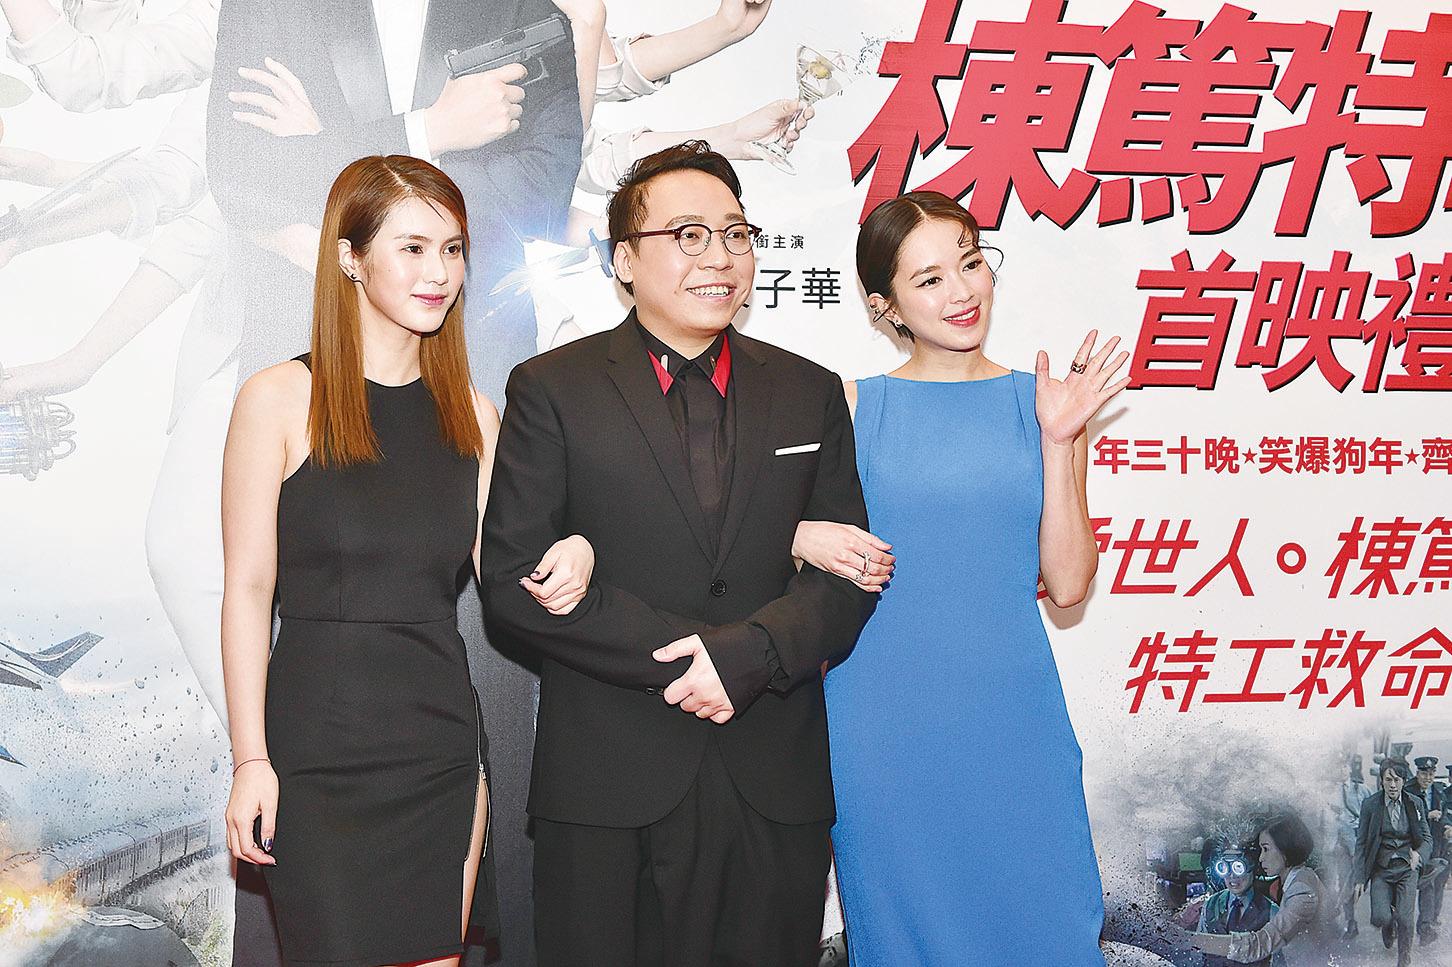 C君(中)在首映禮做司儀,有美女鄧月平(左)與蘇麗珊相伴表現風騷。(郭威利/大紀元)